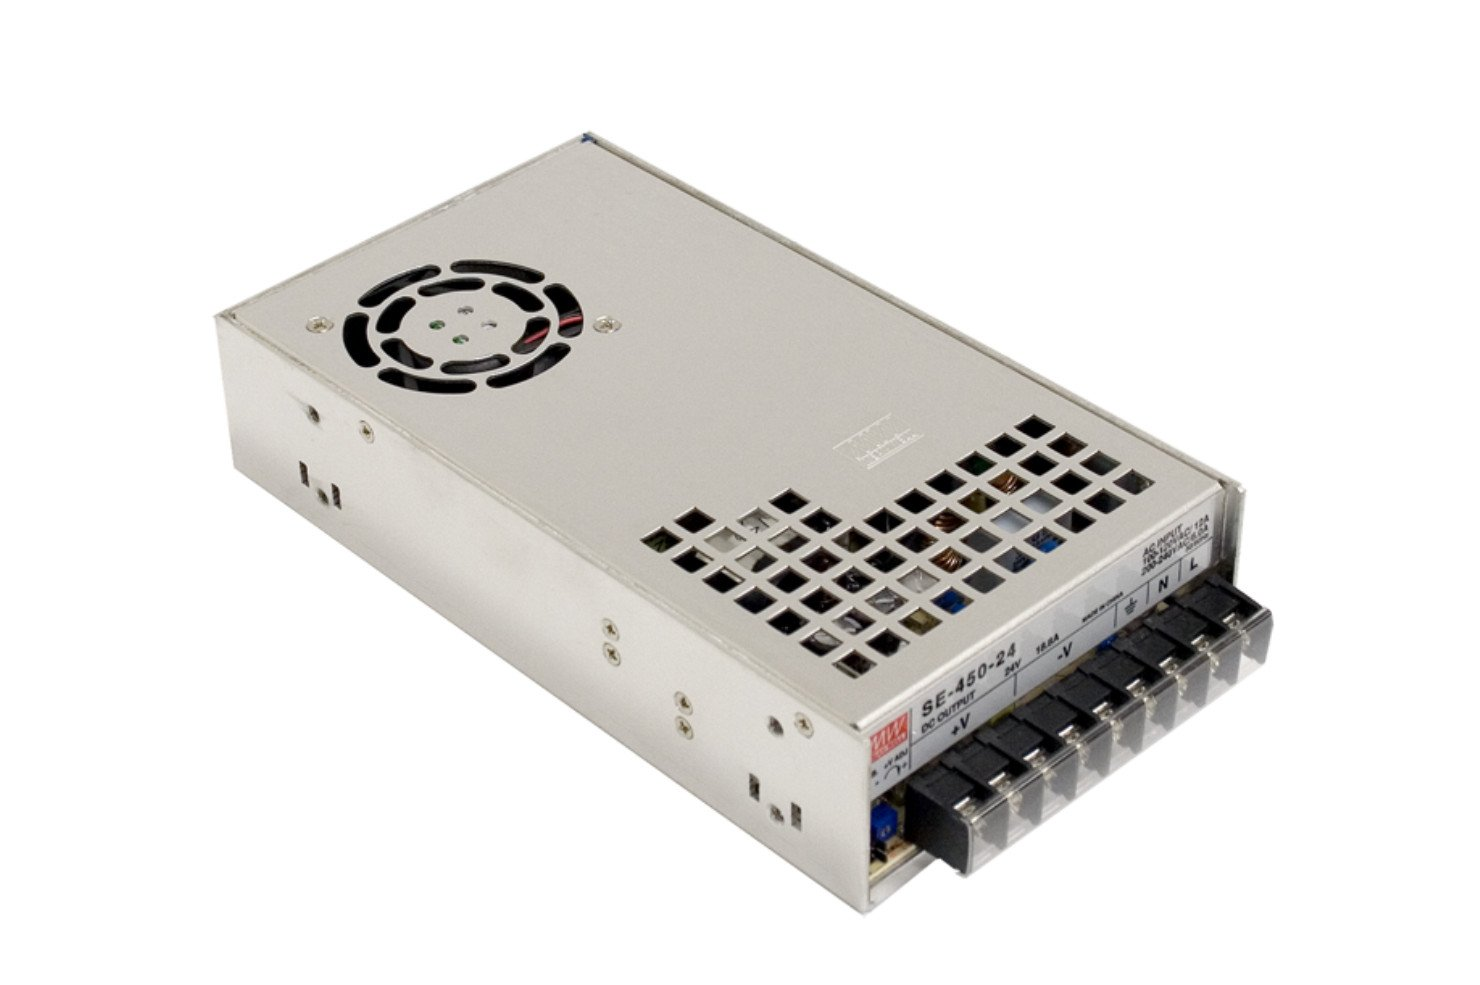 MEAN WELL original SE-450-24 24V 18.8A meanwell SE-450 24V 451.2W Single Output Power Supply